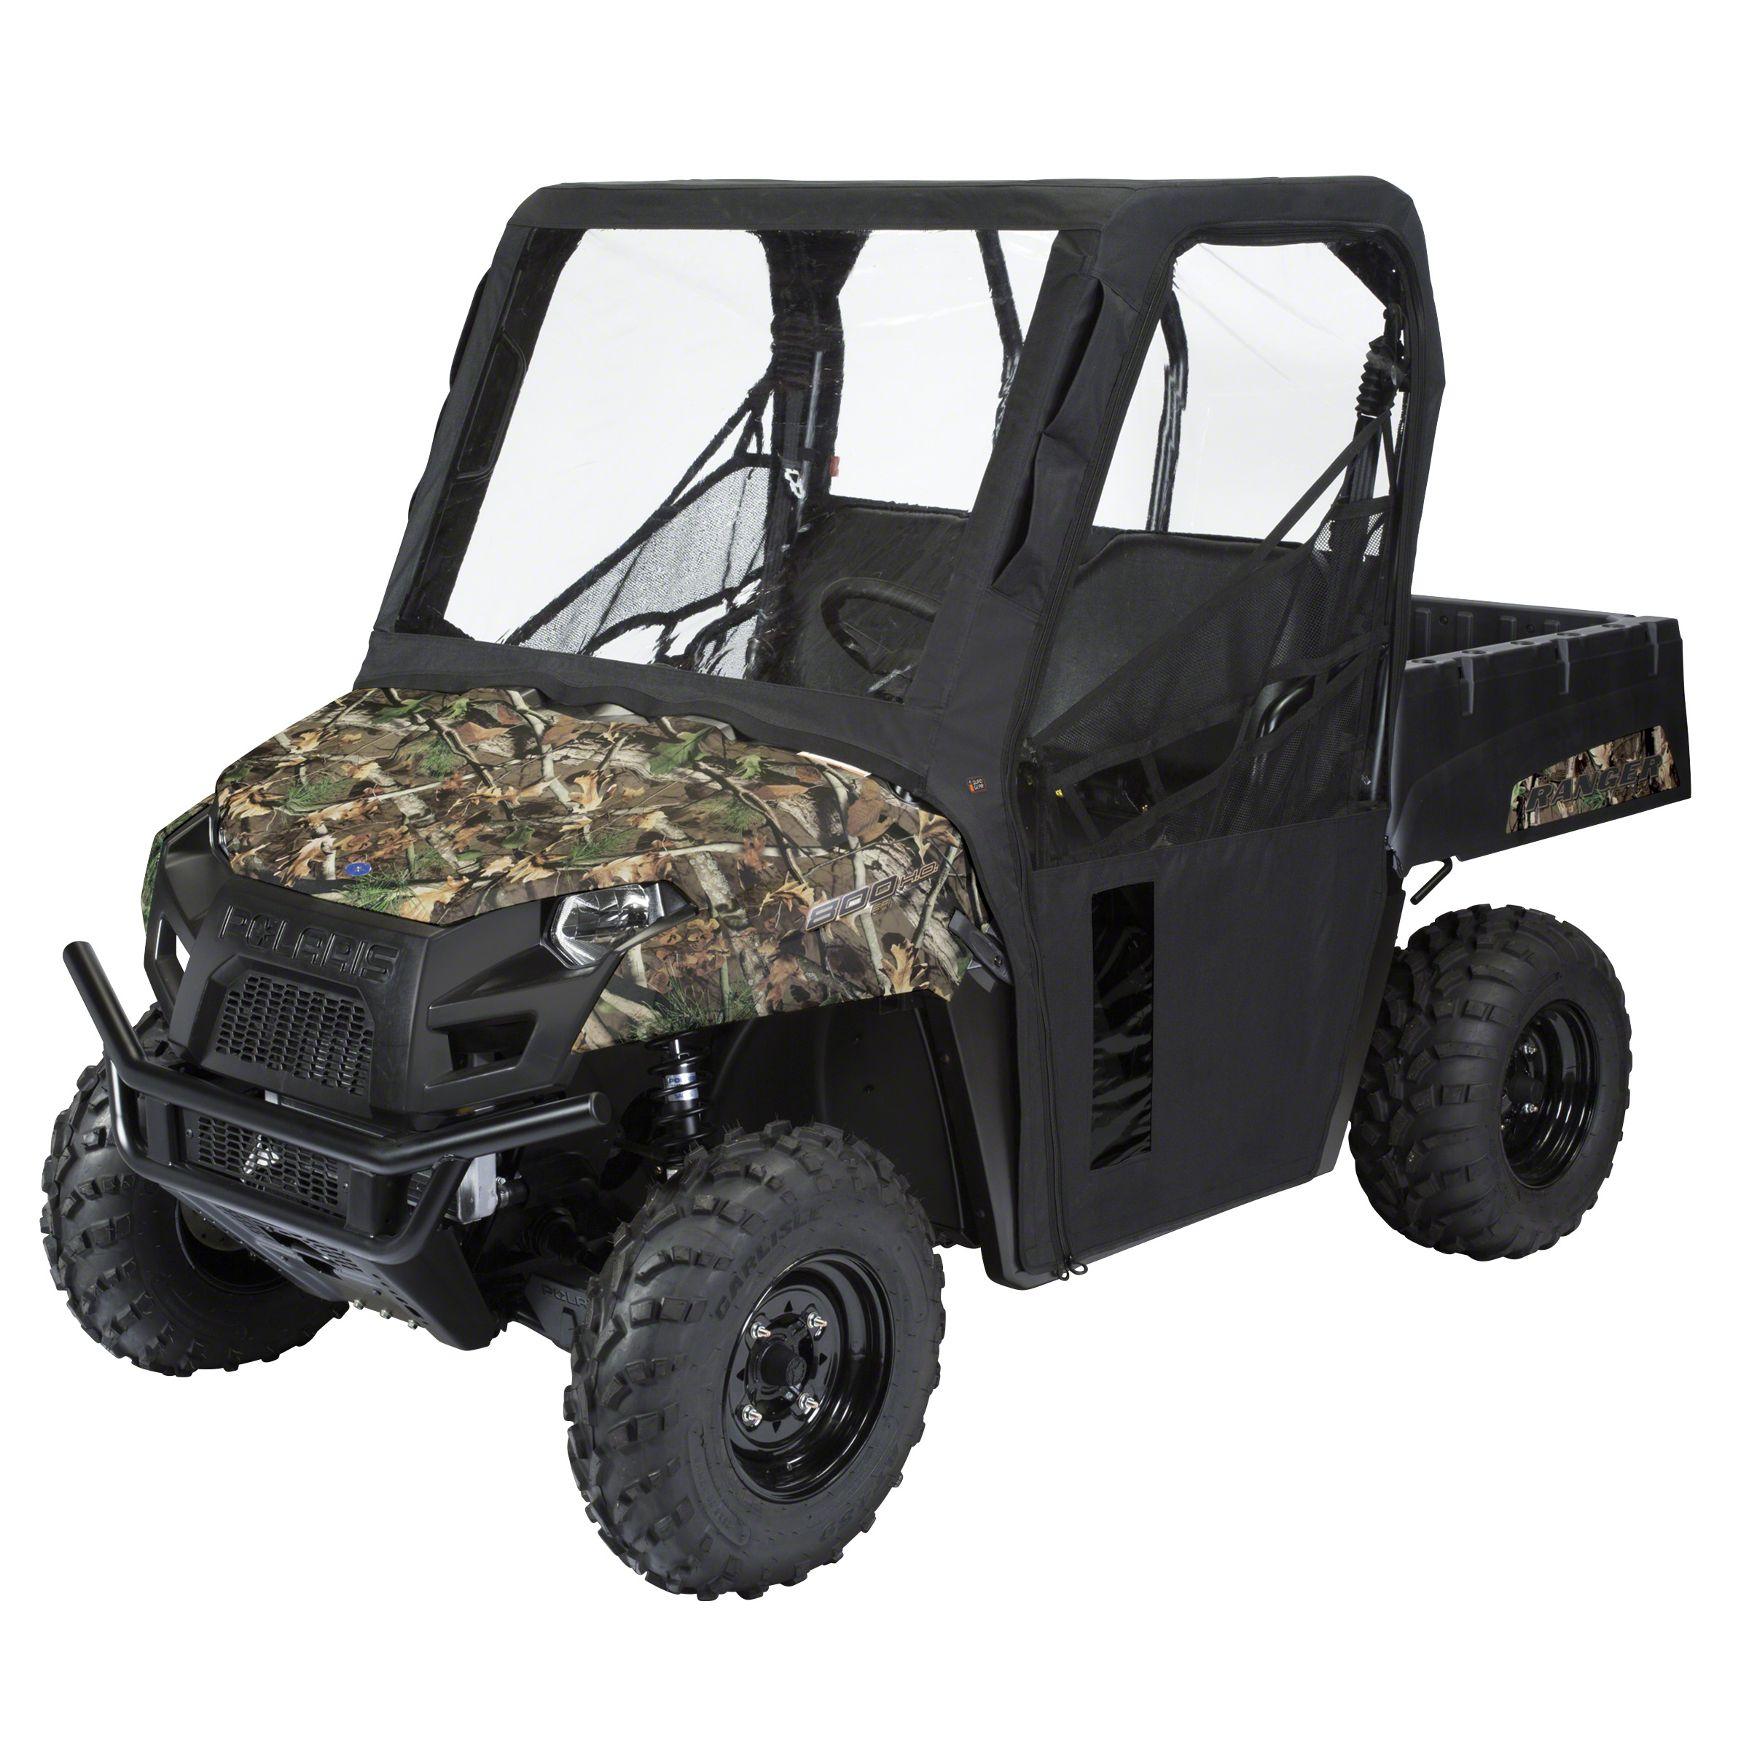 Polaris Ranger 800 Full Size 6x6 800 And Diesel Cab